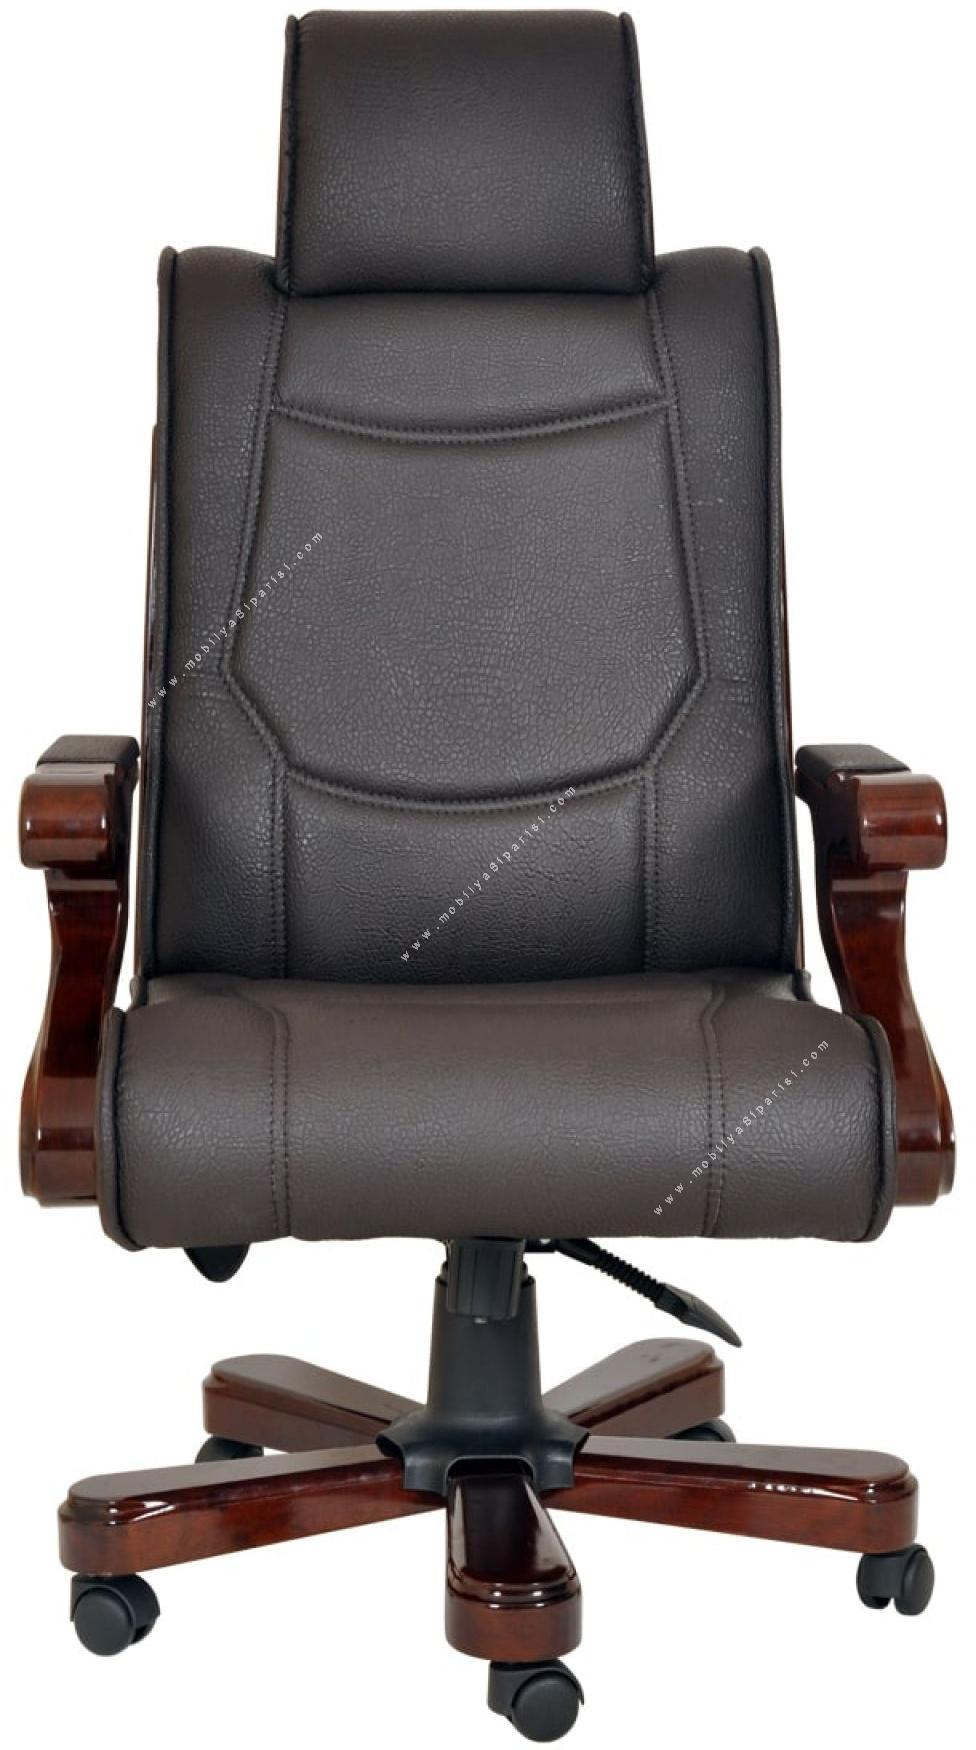 vip ahşap makam koltuğu